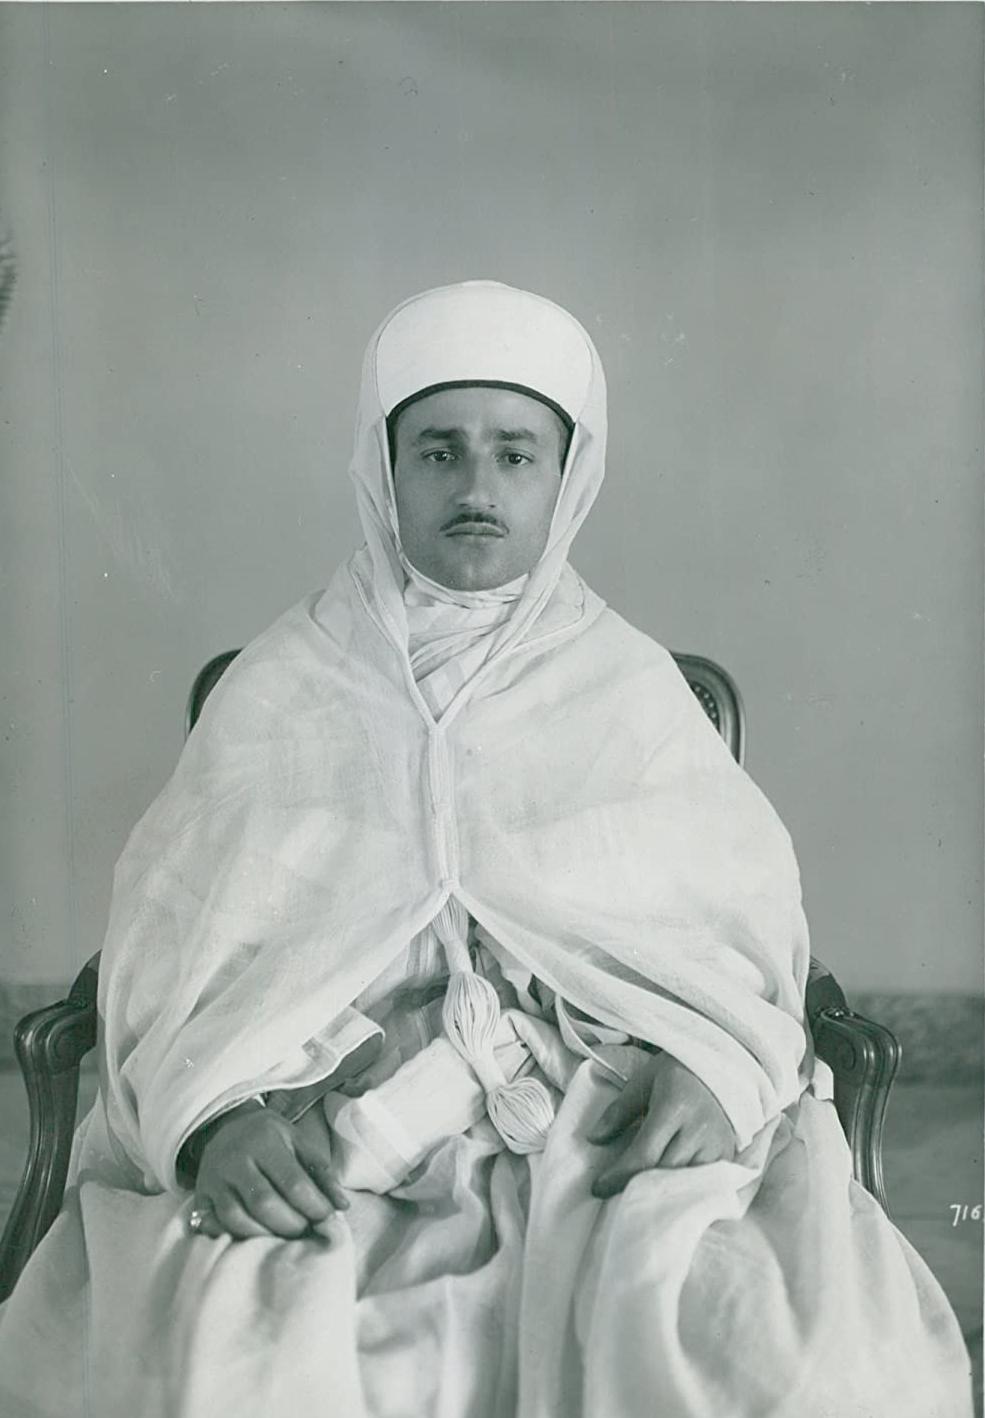 Thami-El-Glaoui-Pasha-of-Marrakesh-71Ia3-iQqaL._AC_SL1500_